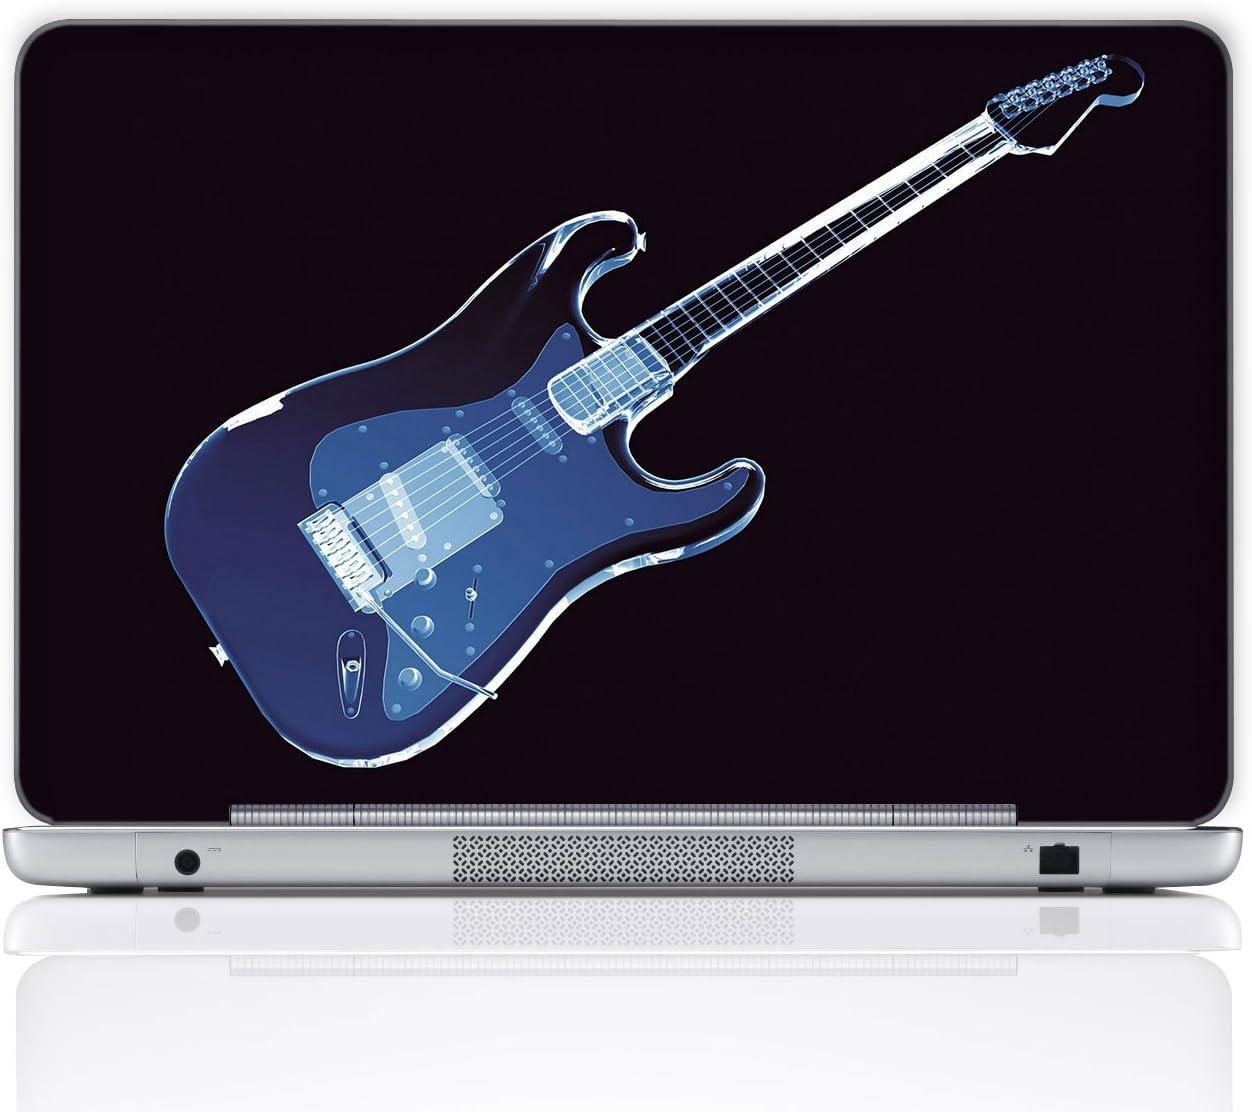 Meffort Inc 15 15.6 Inch Laptop Notebook Skin Sticker Cover Art Decal (Free Wrist pad) - Blue Guitar